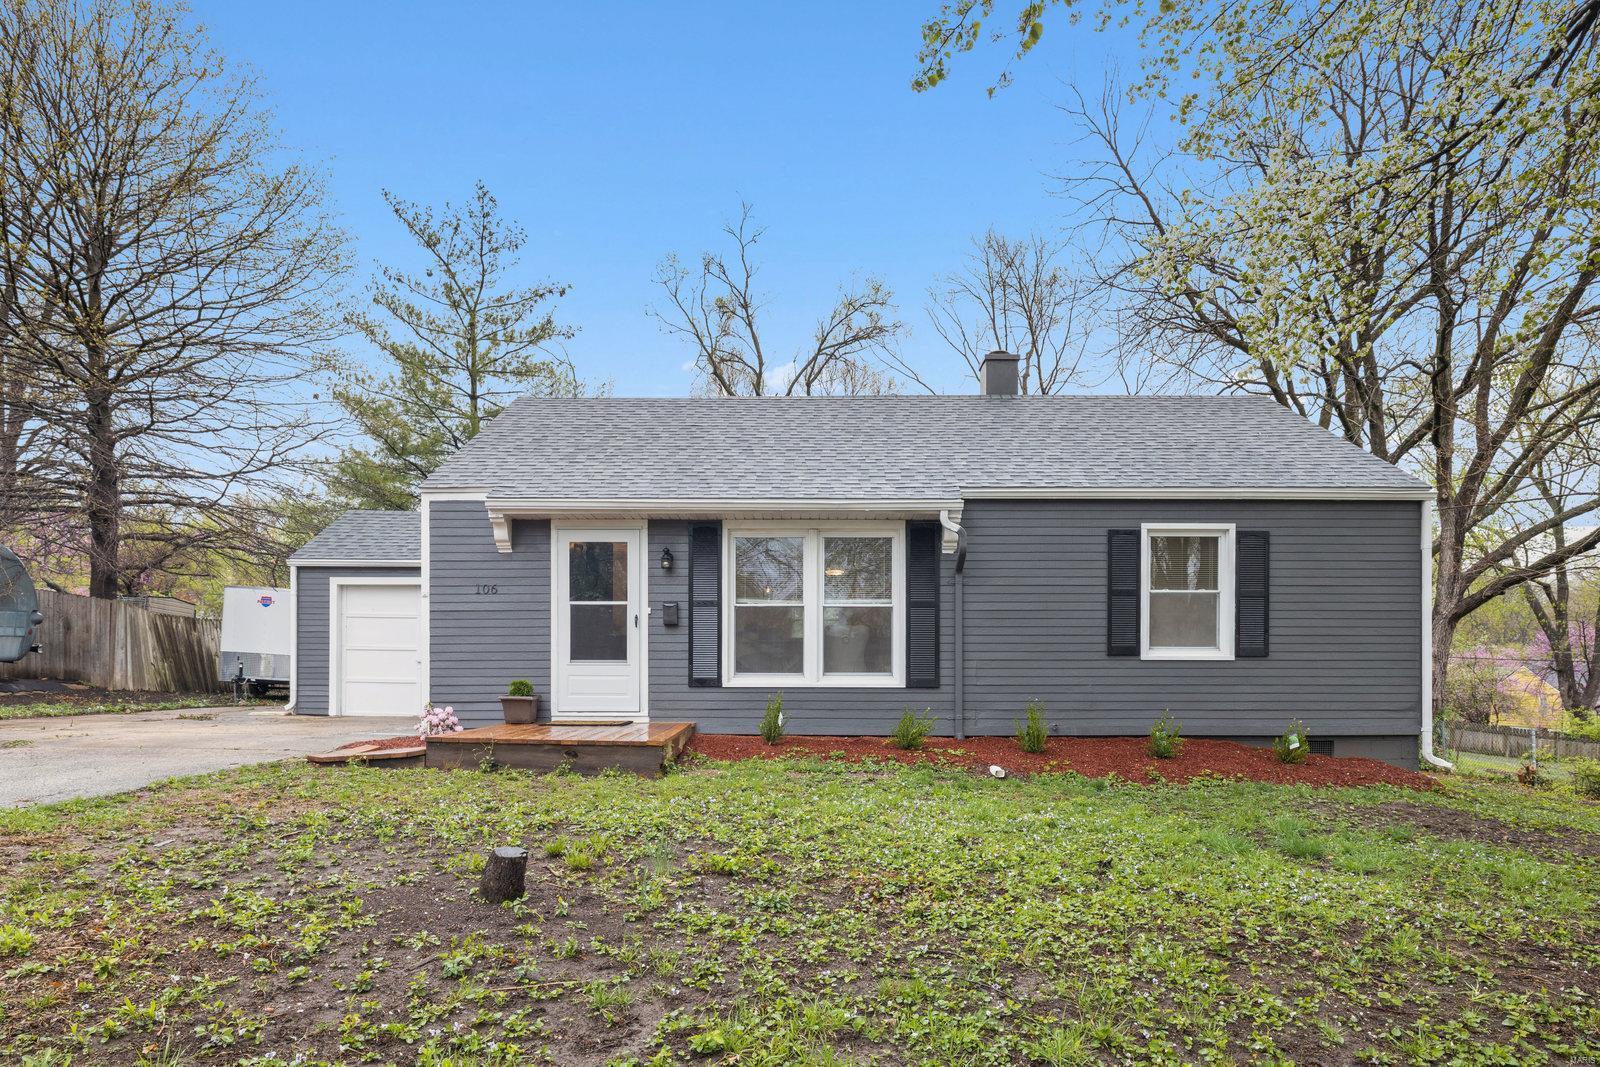 106 W 97TH Terr Property Photo - Kansas City, MO real estate listing